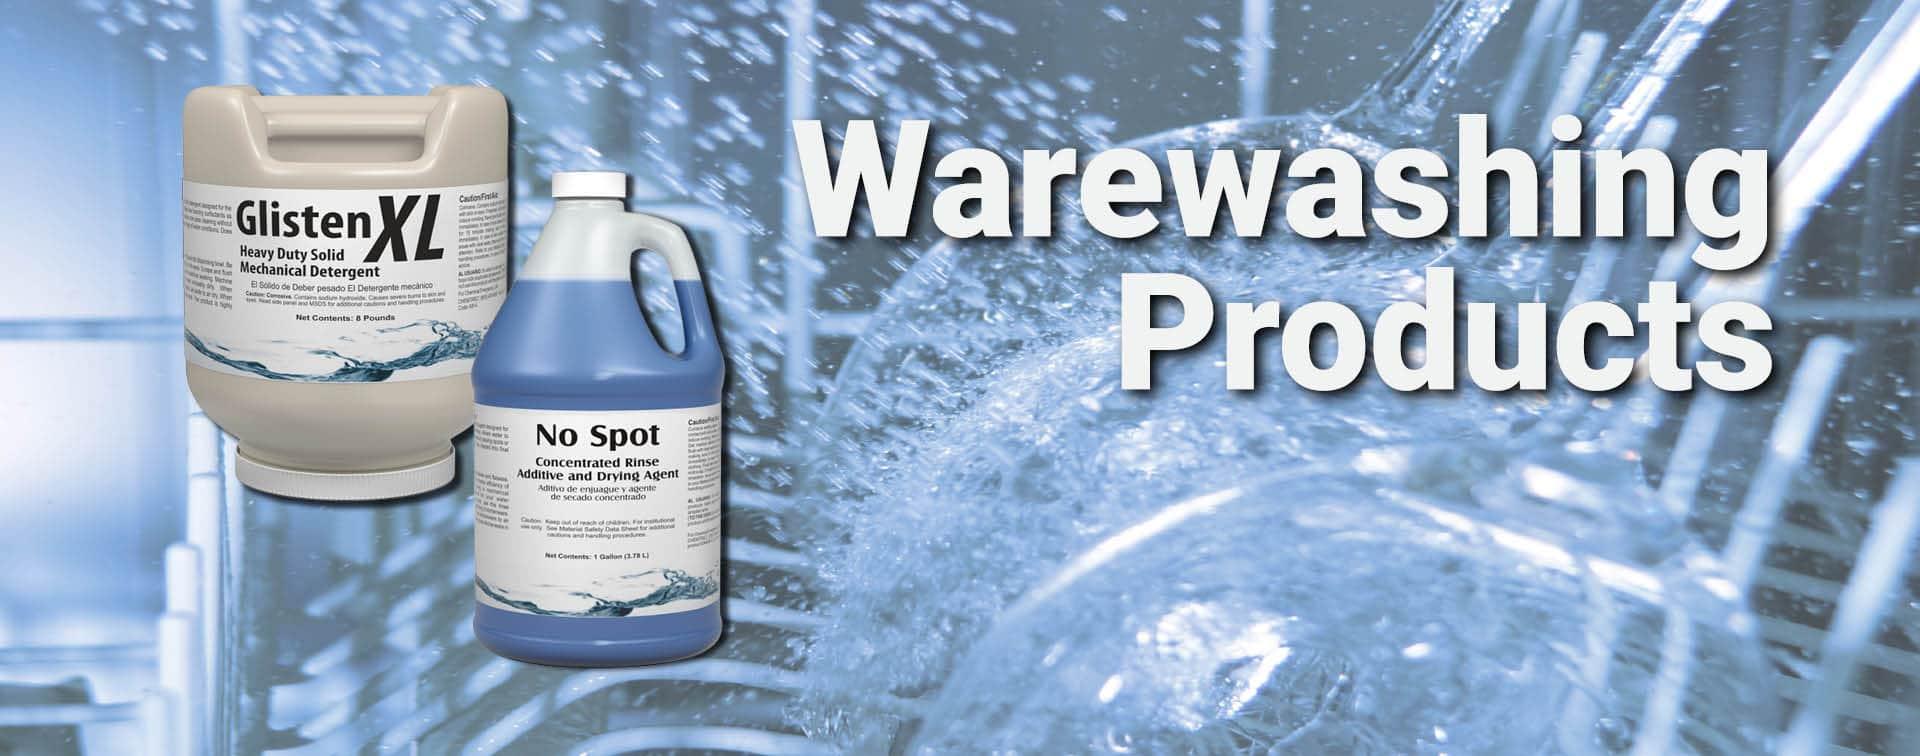 warewash-2-6-min